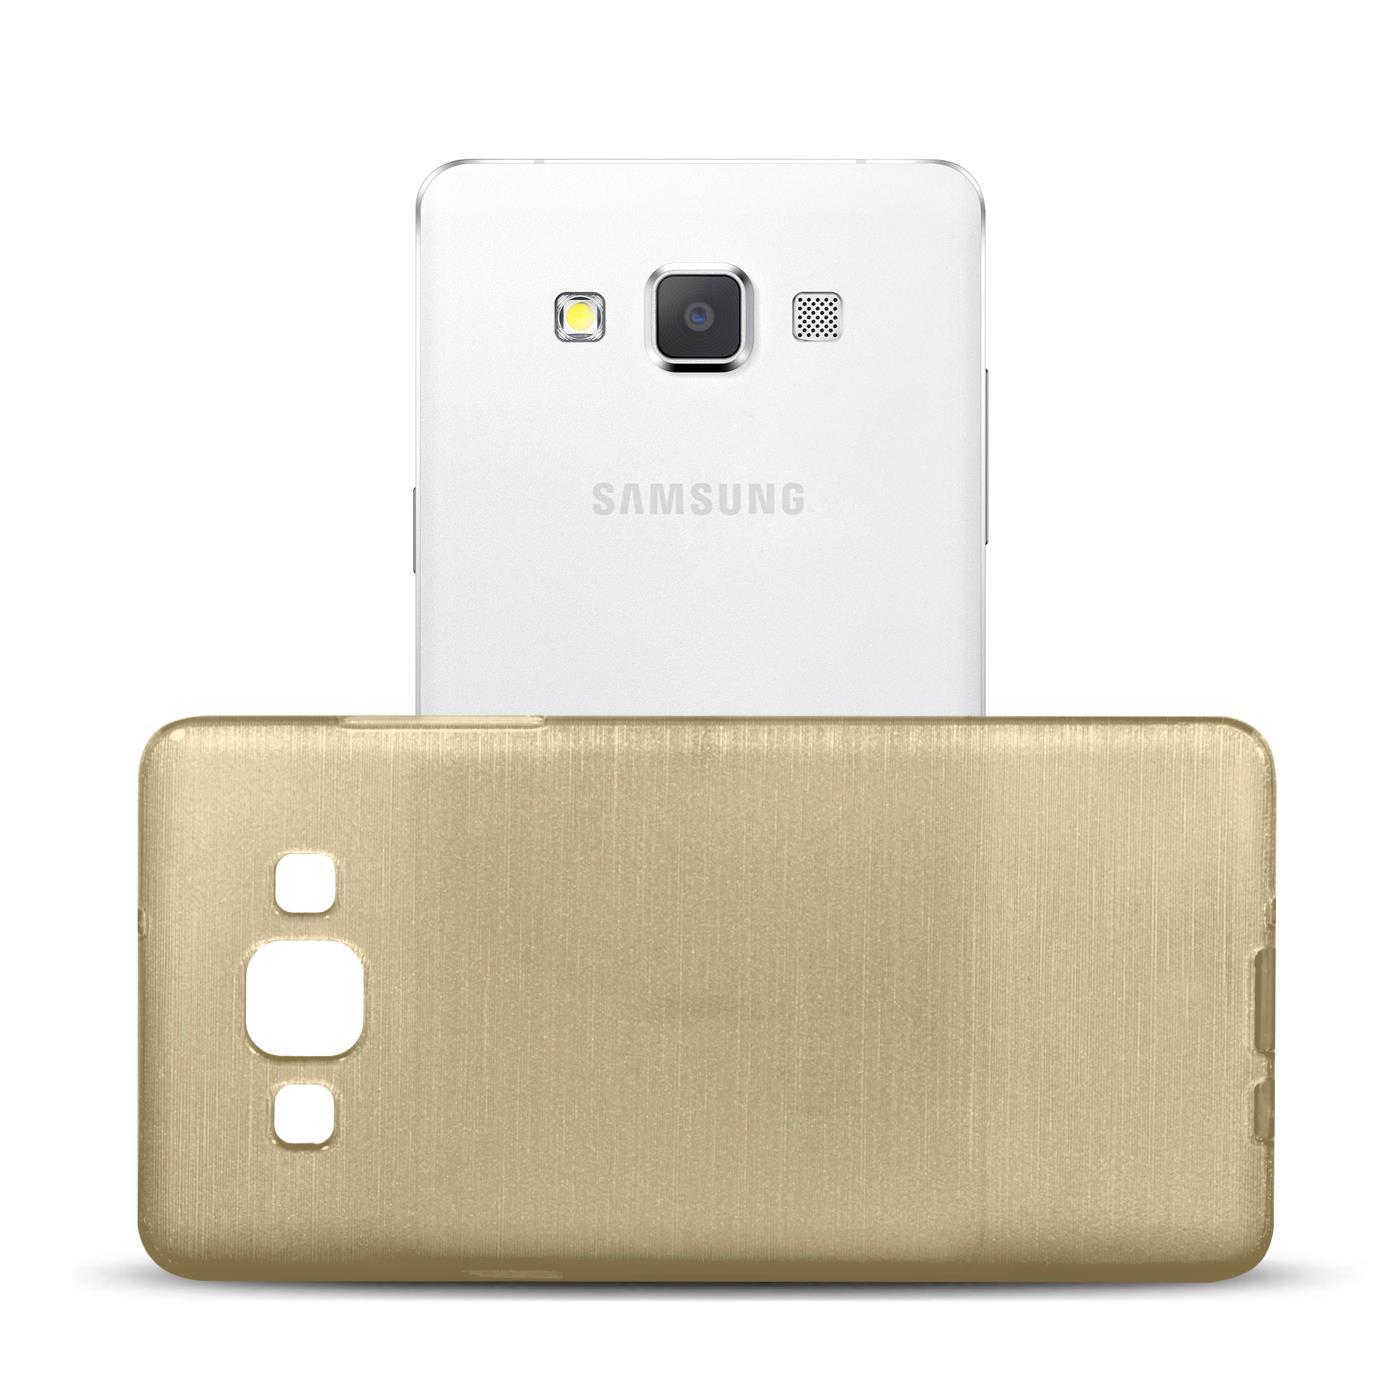 Silikon-Bumper-Case-Samsung-Galaxy-a5-2015-Ultra-Slim-Stossfeste-Rueckschale Indexbild 12